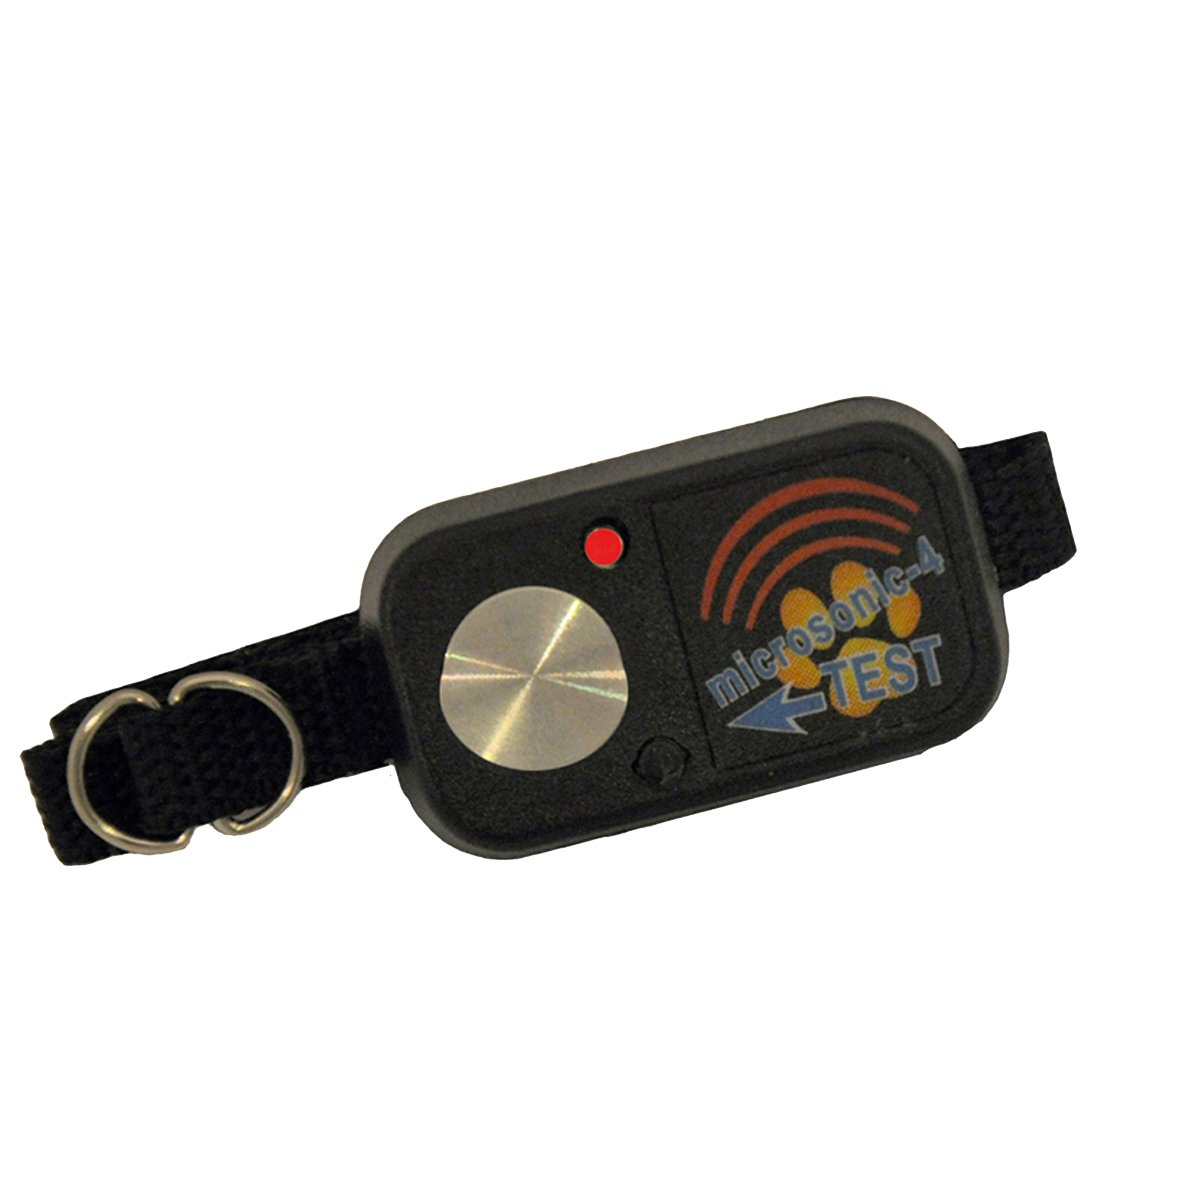 High Tech Pet MS-4 Microsonic Water Resistant Digital Transmitter Pet Collar by High Tech Pet